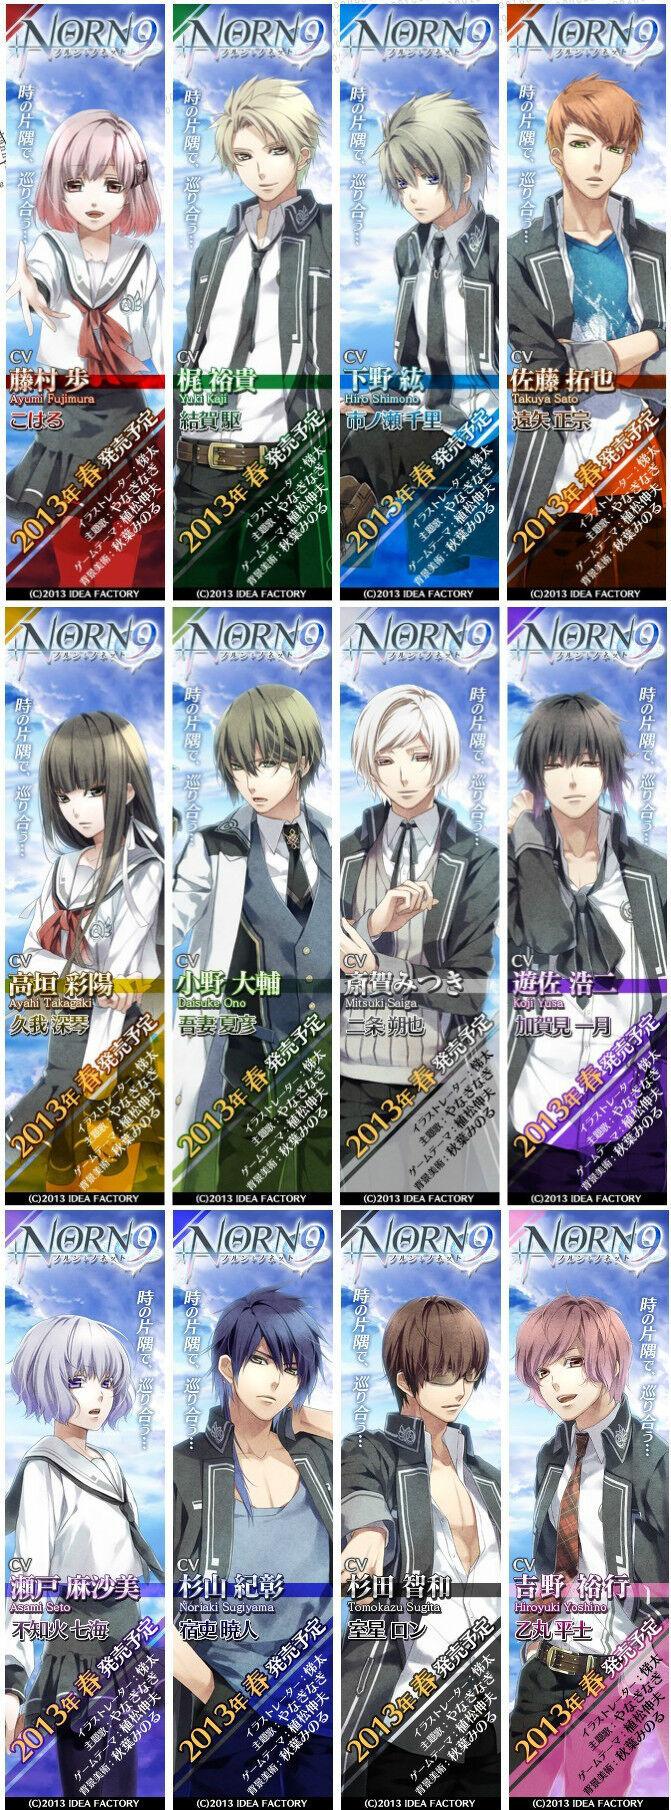 Norn9 Characters.jpg